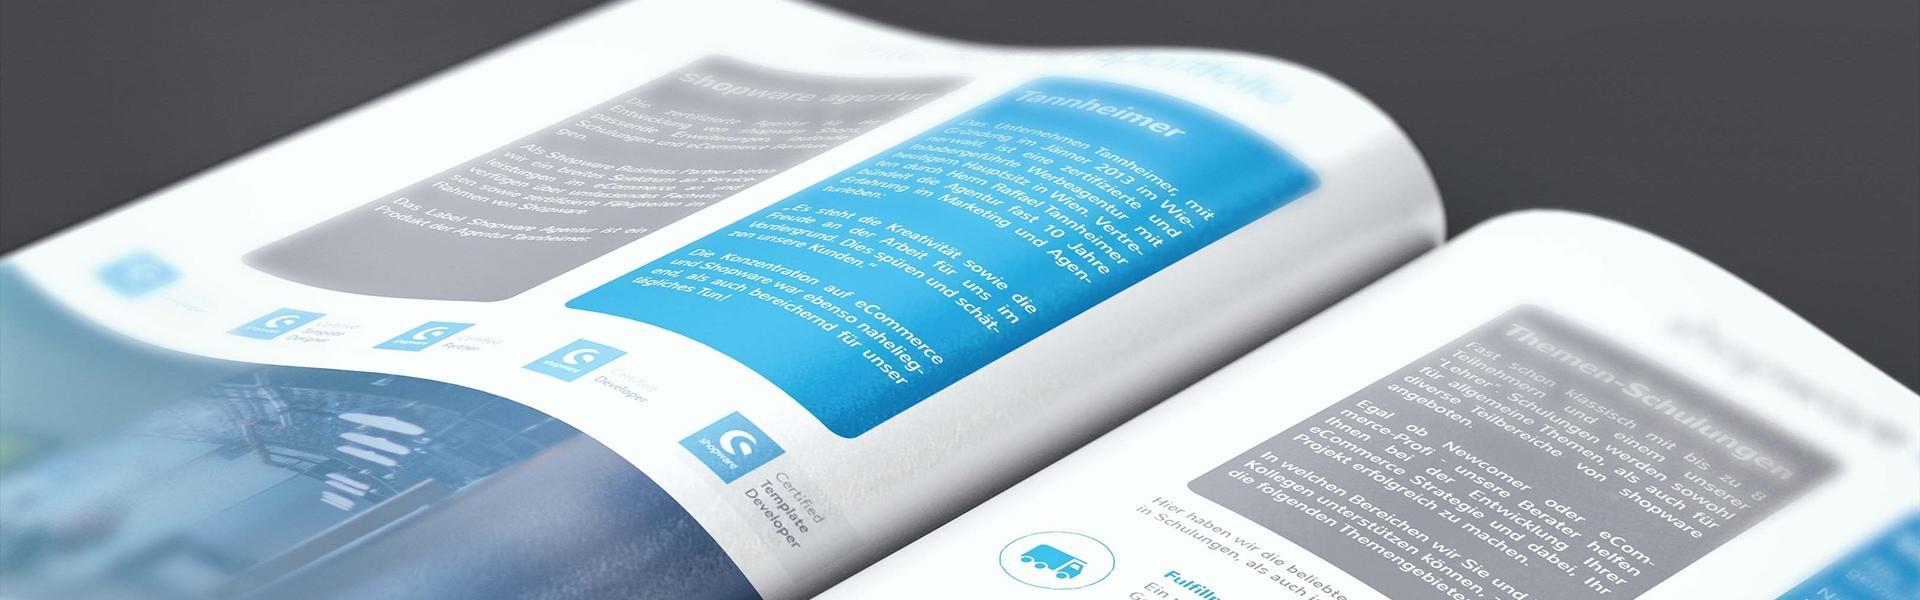 shopware agentur cover